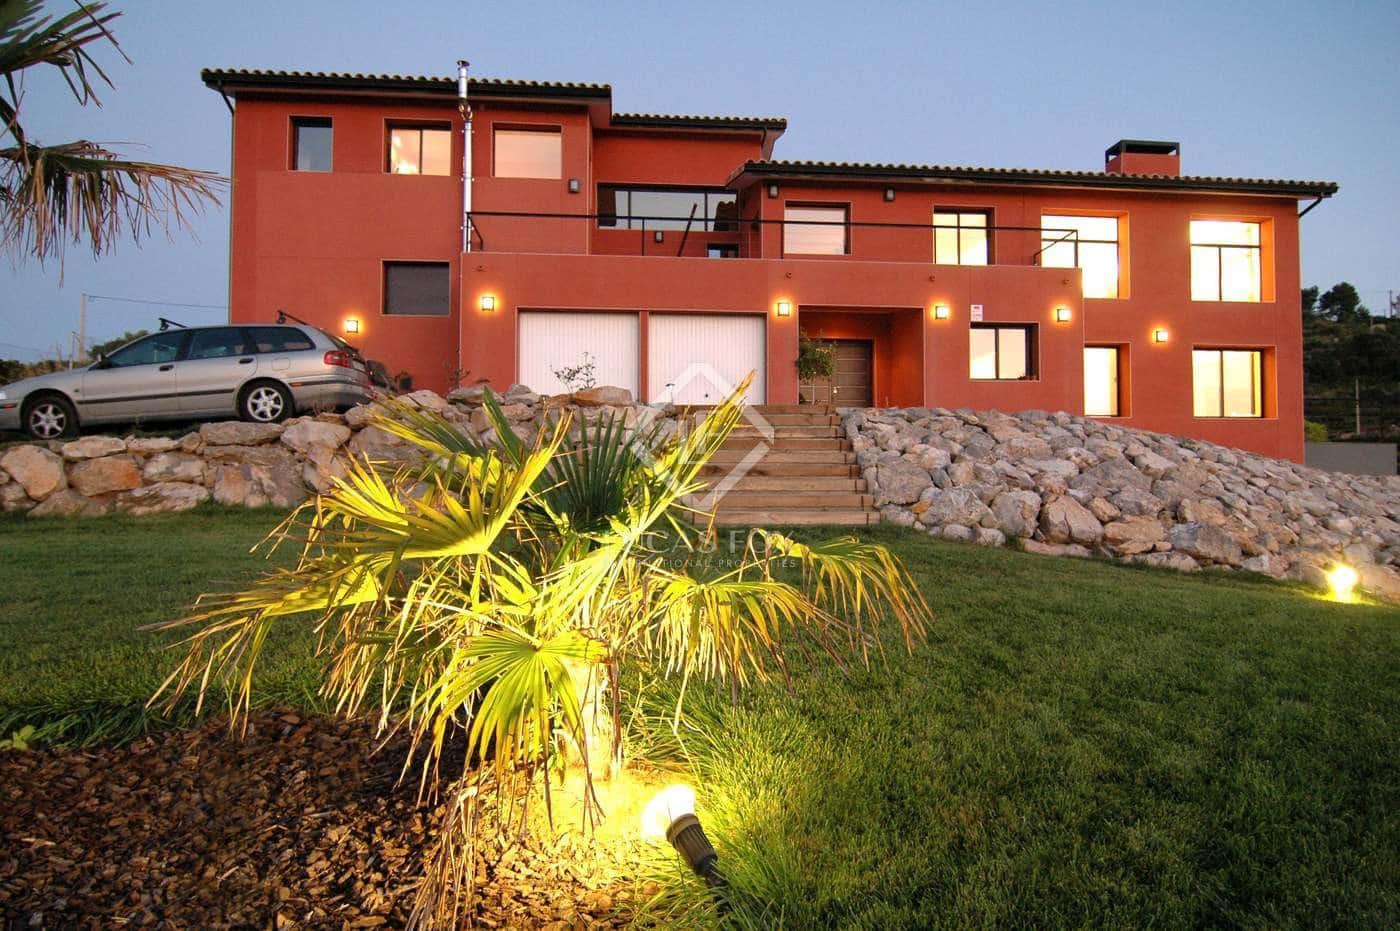 5 bedroom Villa for sale in Olivella with pool garage - € 745,000 (Ref: 2535966)